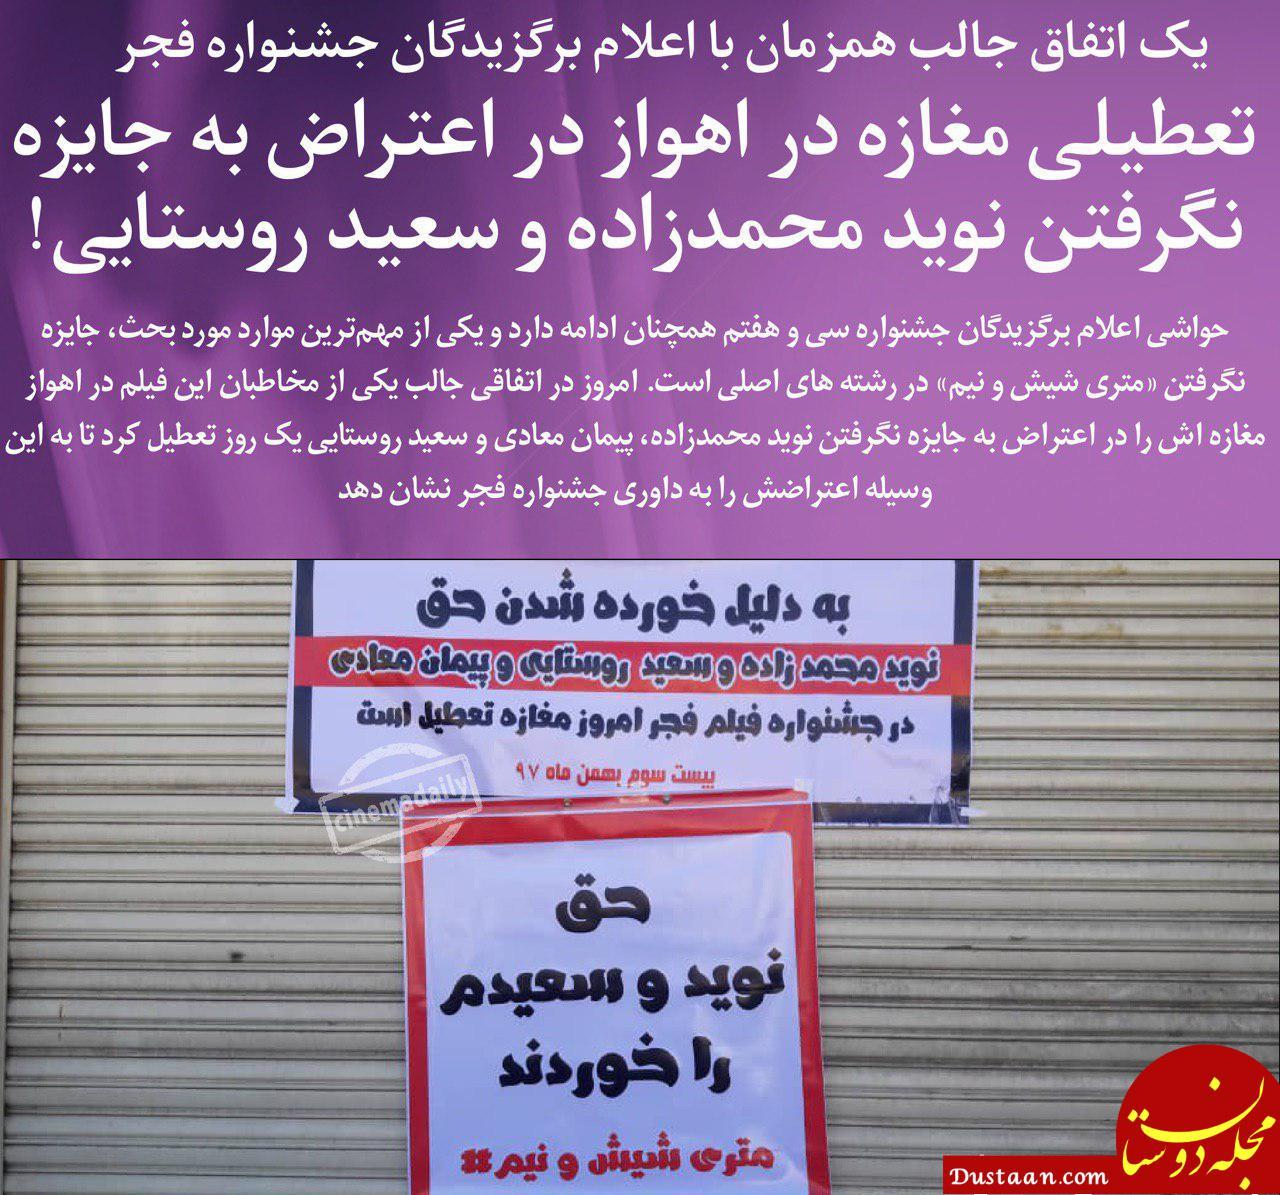 www.dustaan.com تعطیلی مغازه در اهواز در اعتراض به جایزه نگرفتن «متری شیش و نیم»! +عکس